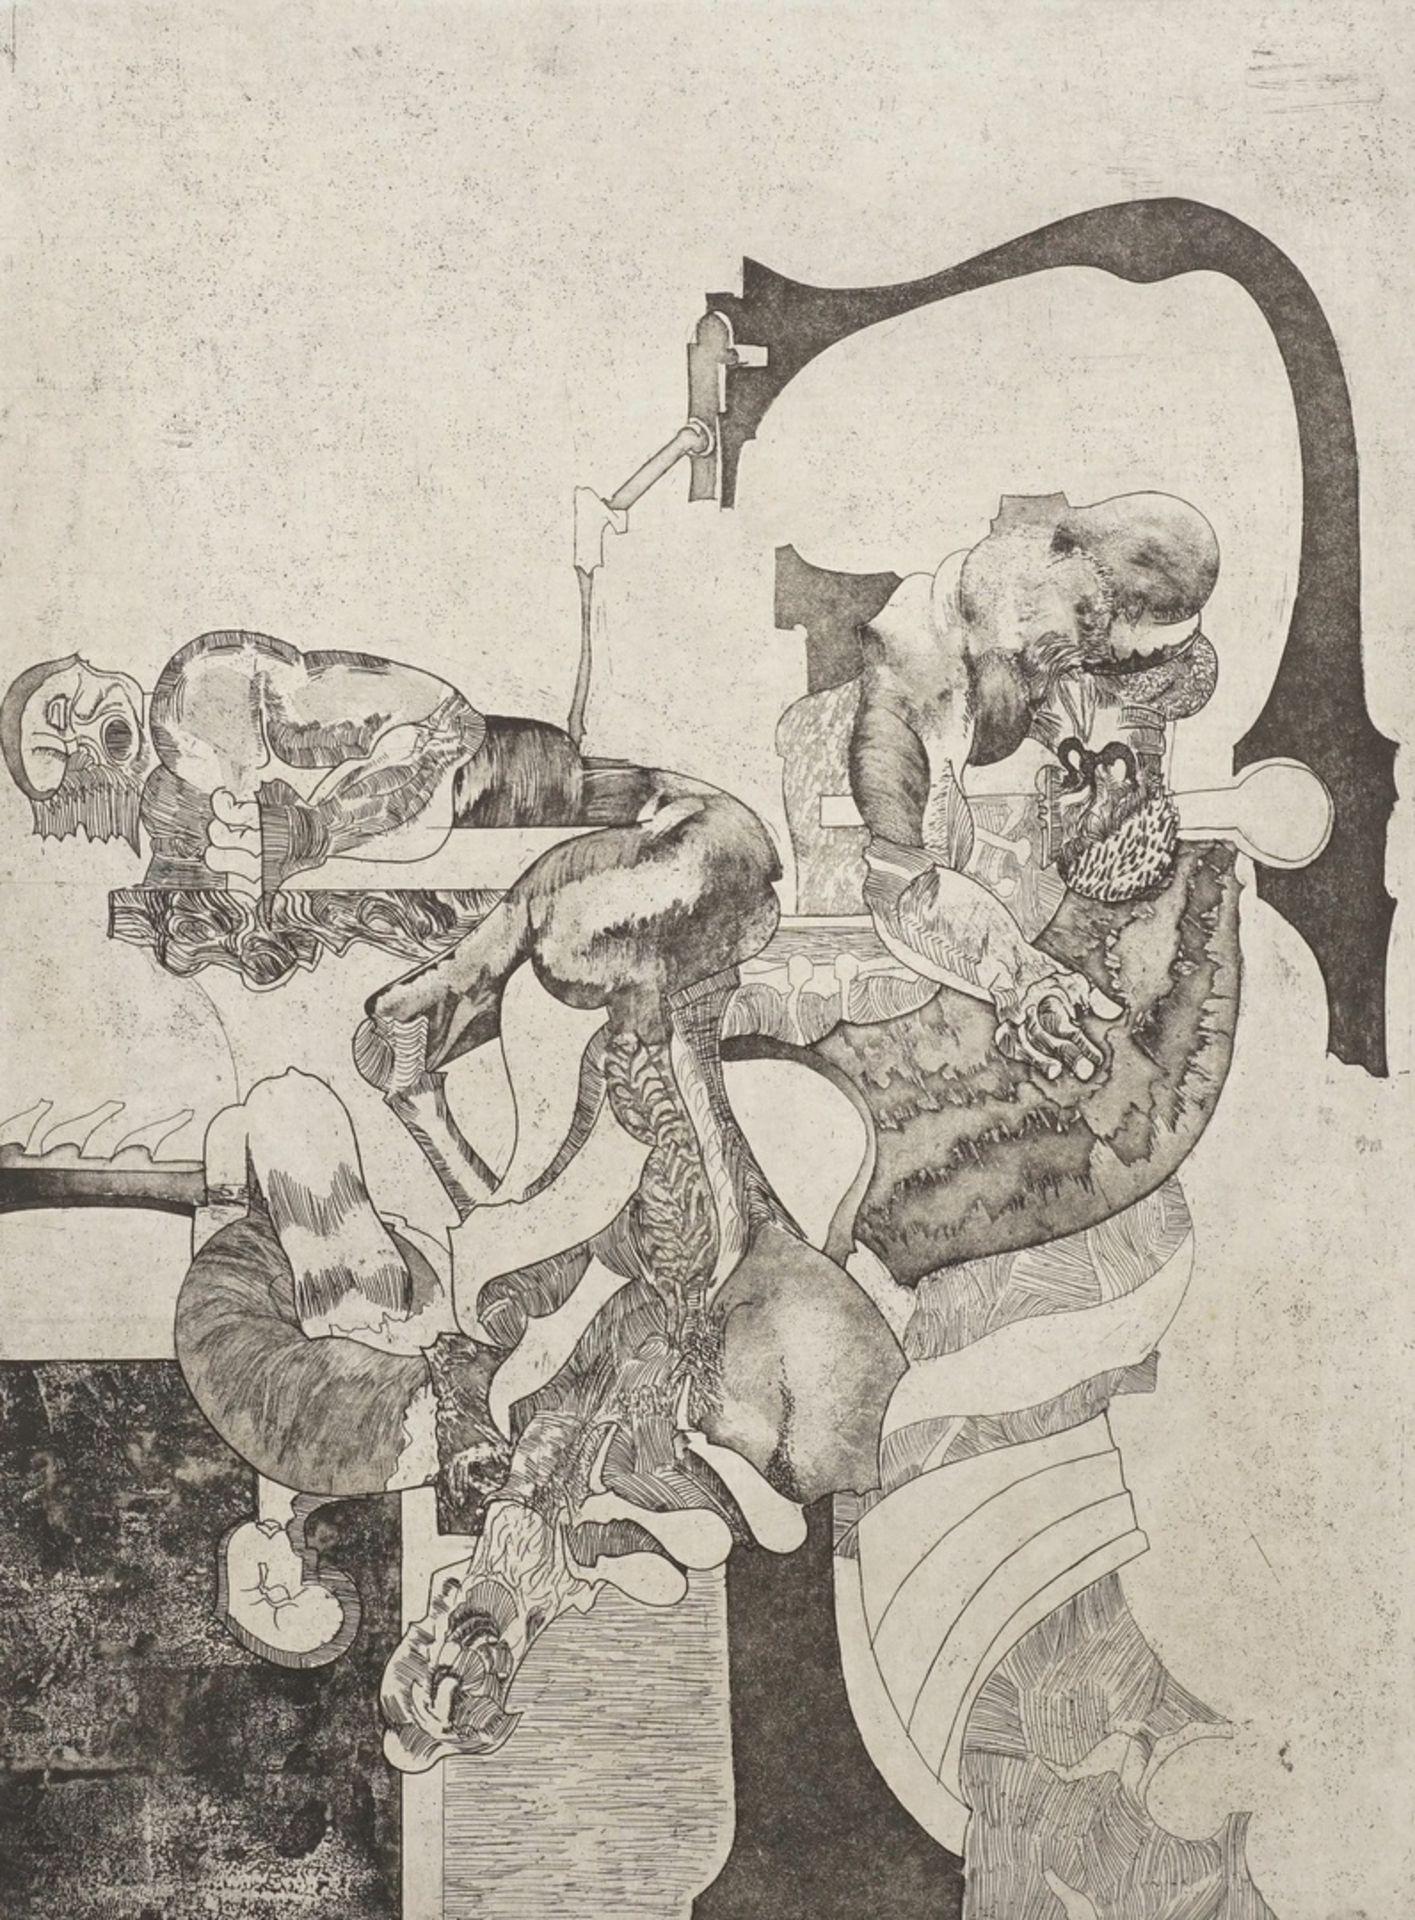 Unbekannter Künstler, Biomorphe Mechanik (Surreale Szene)